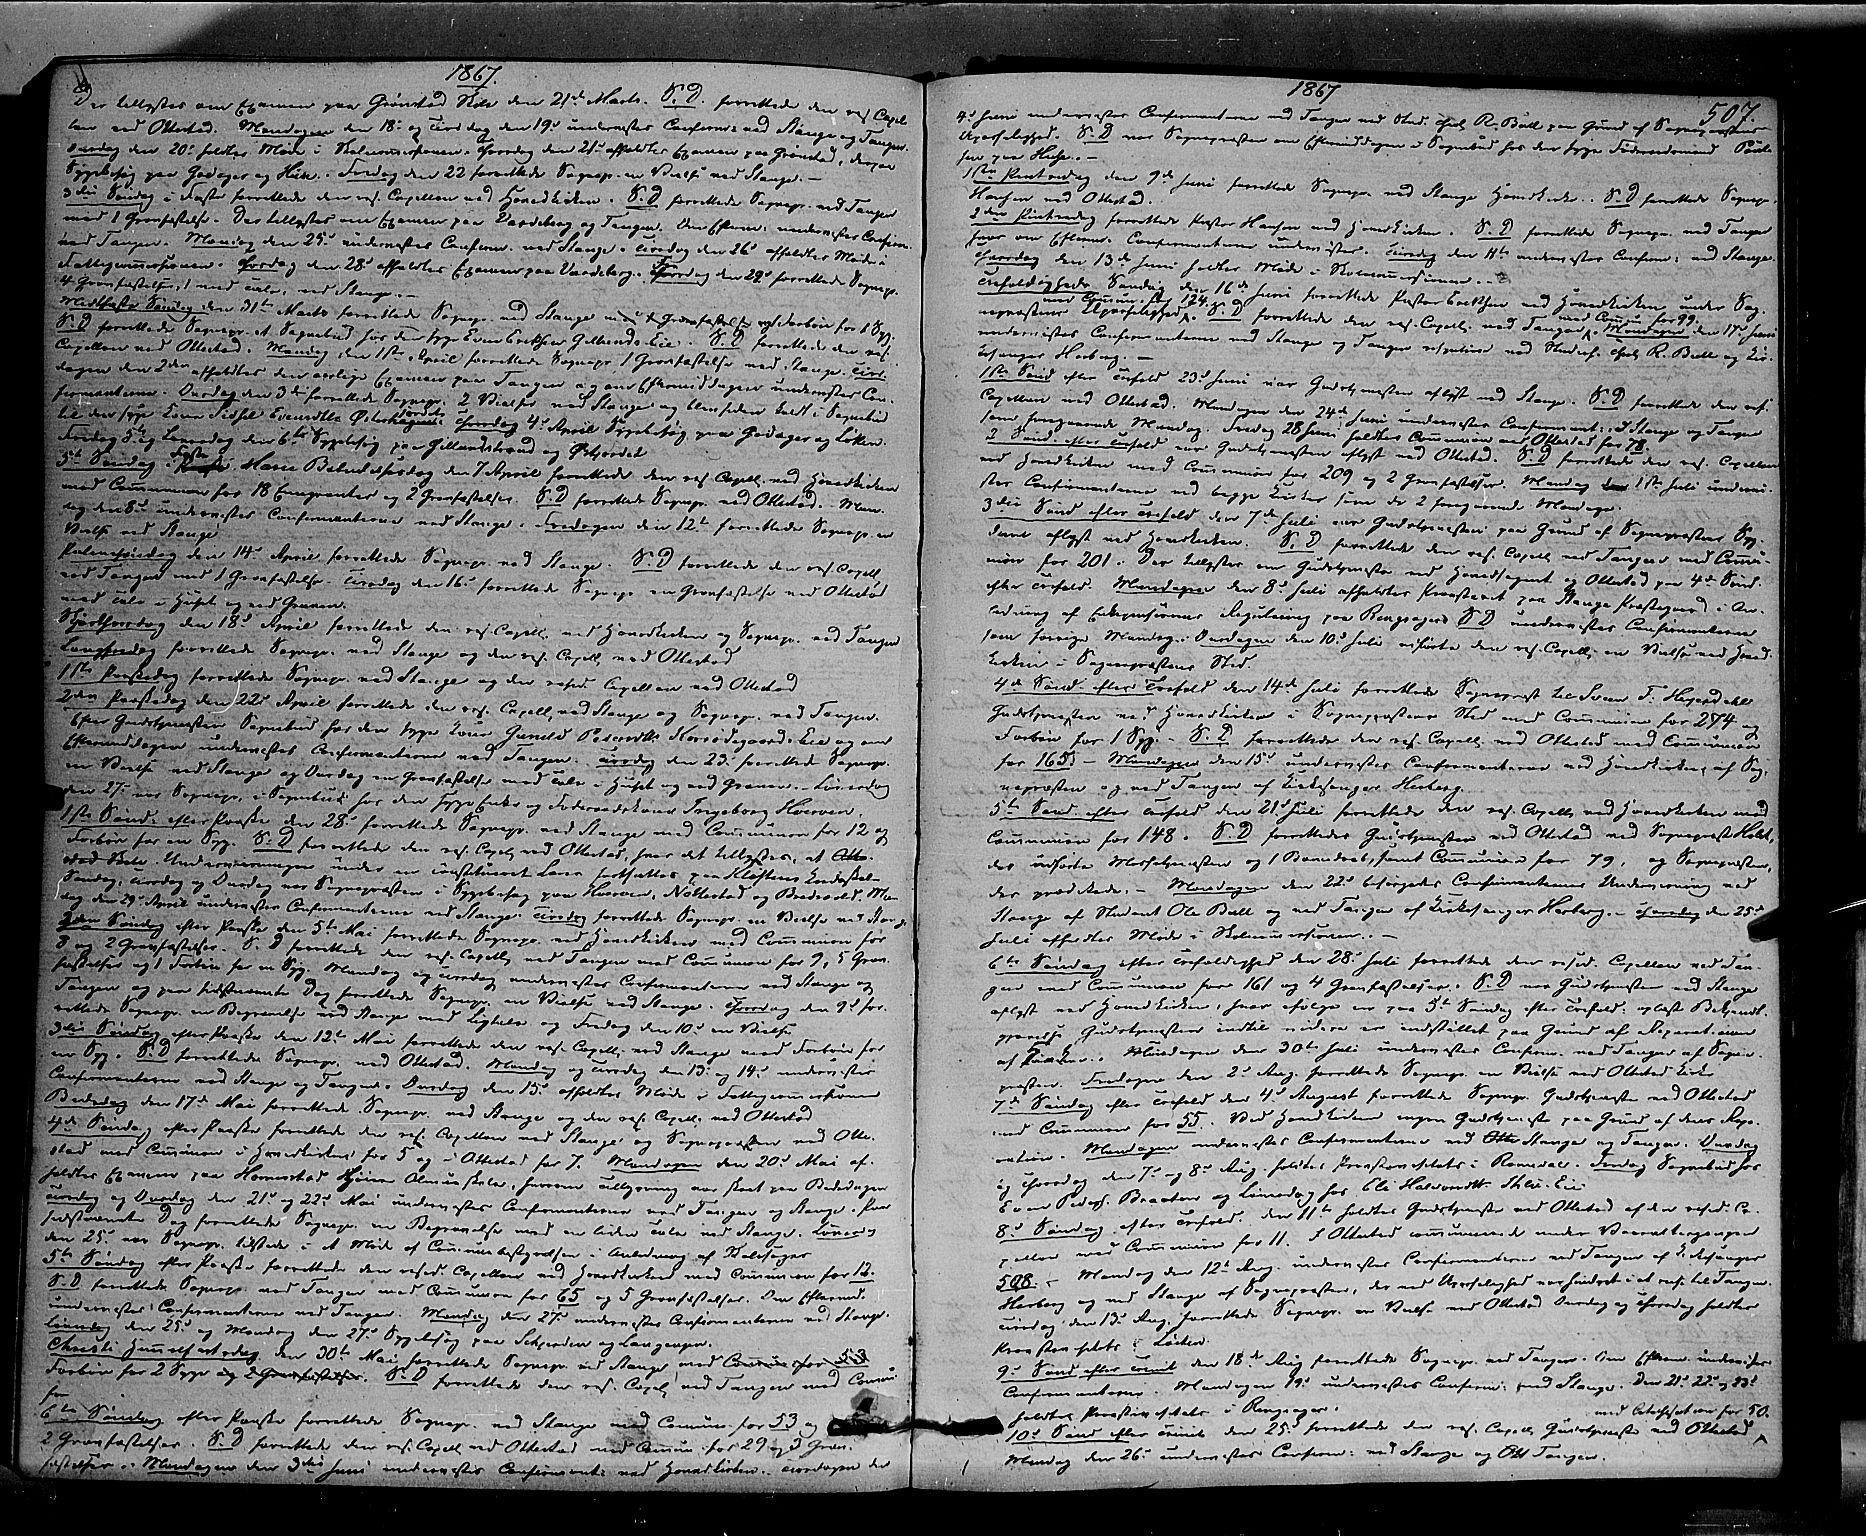 SAH, Stange prestekontor, K/L0013: Ministerialbok nr. 13, 1862-1879, s. 507